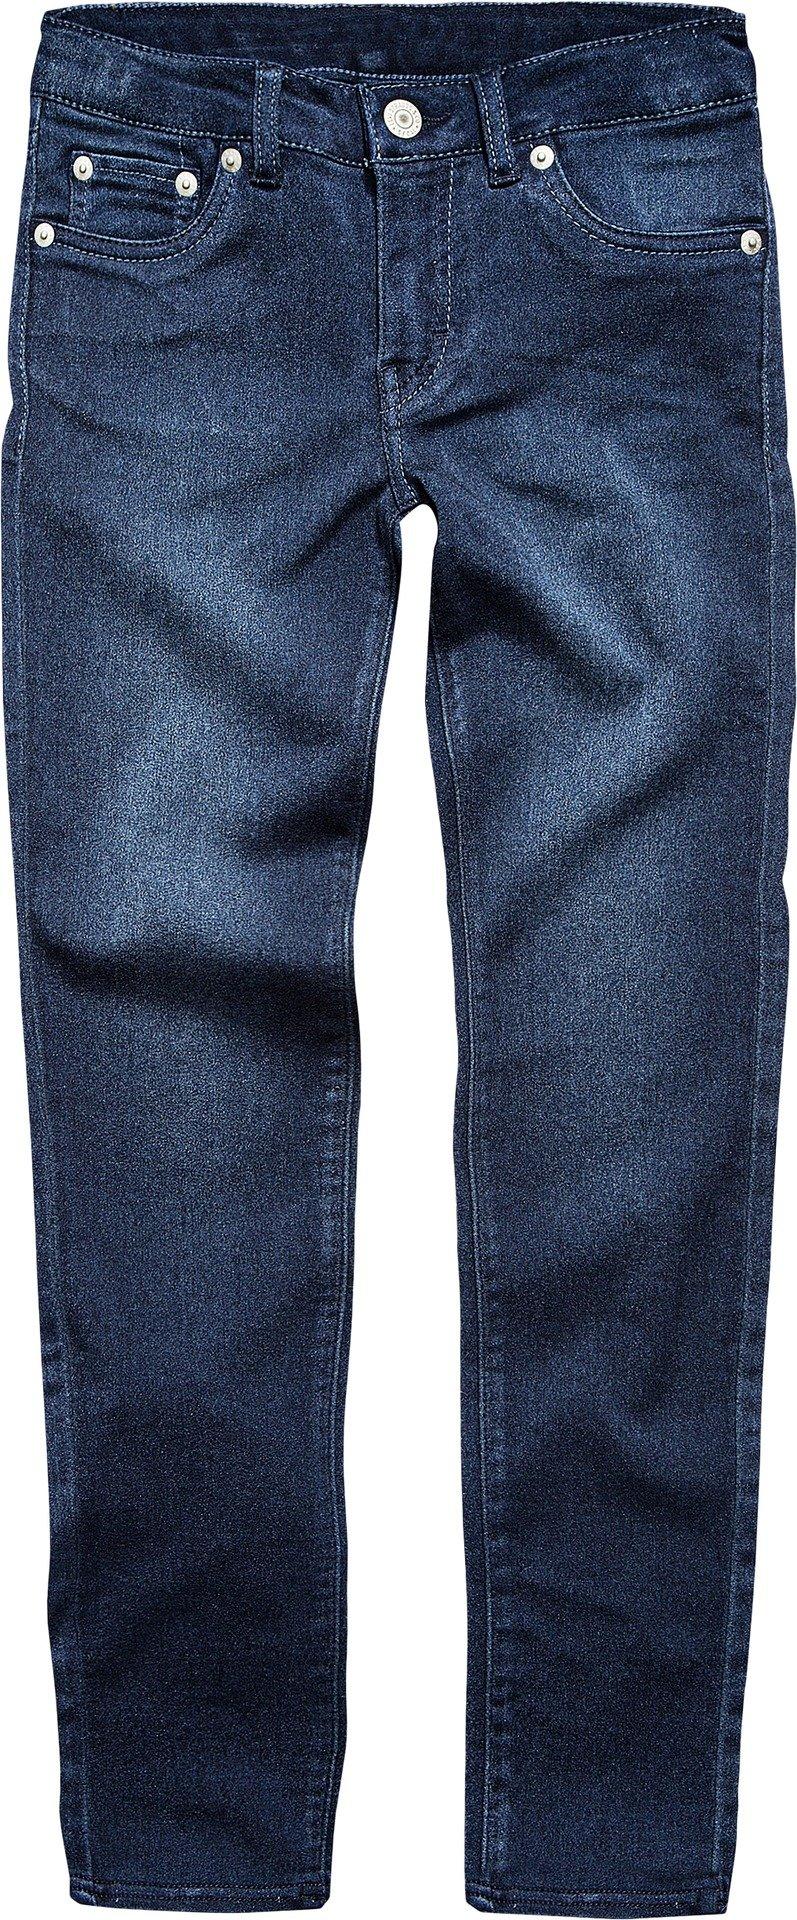 Levi's Big Girls' 710 Super Skinny Fit Soft Jeans, Dark Indigo, 14